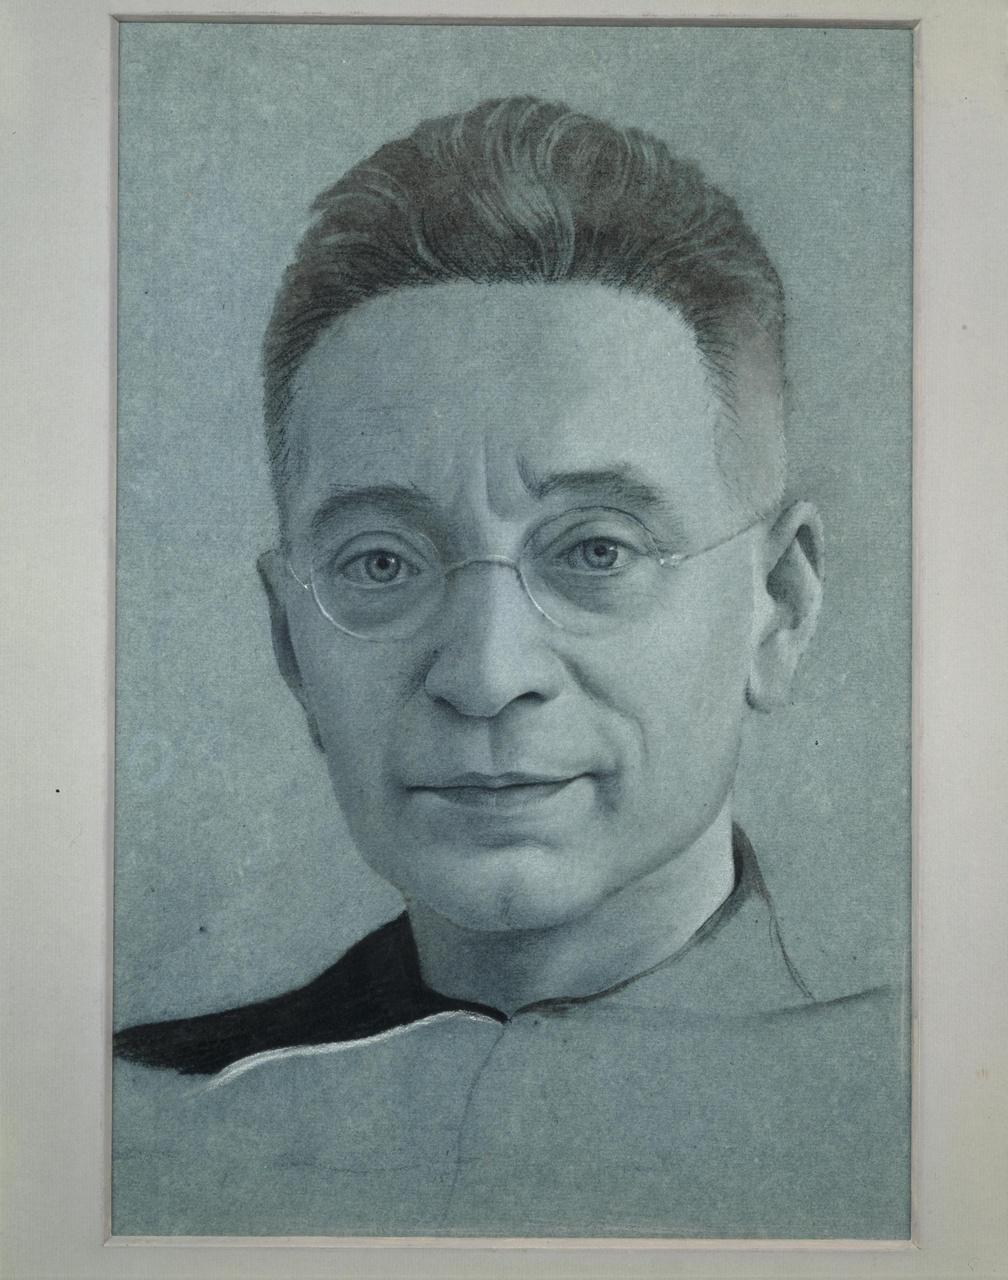 Portret van Titus Brandsma (1881-1942)